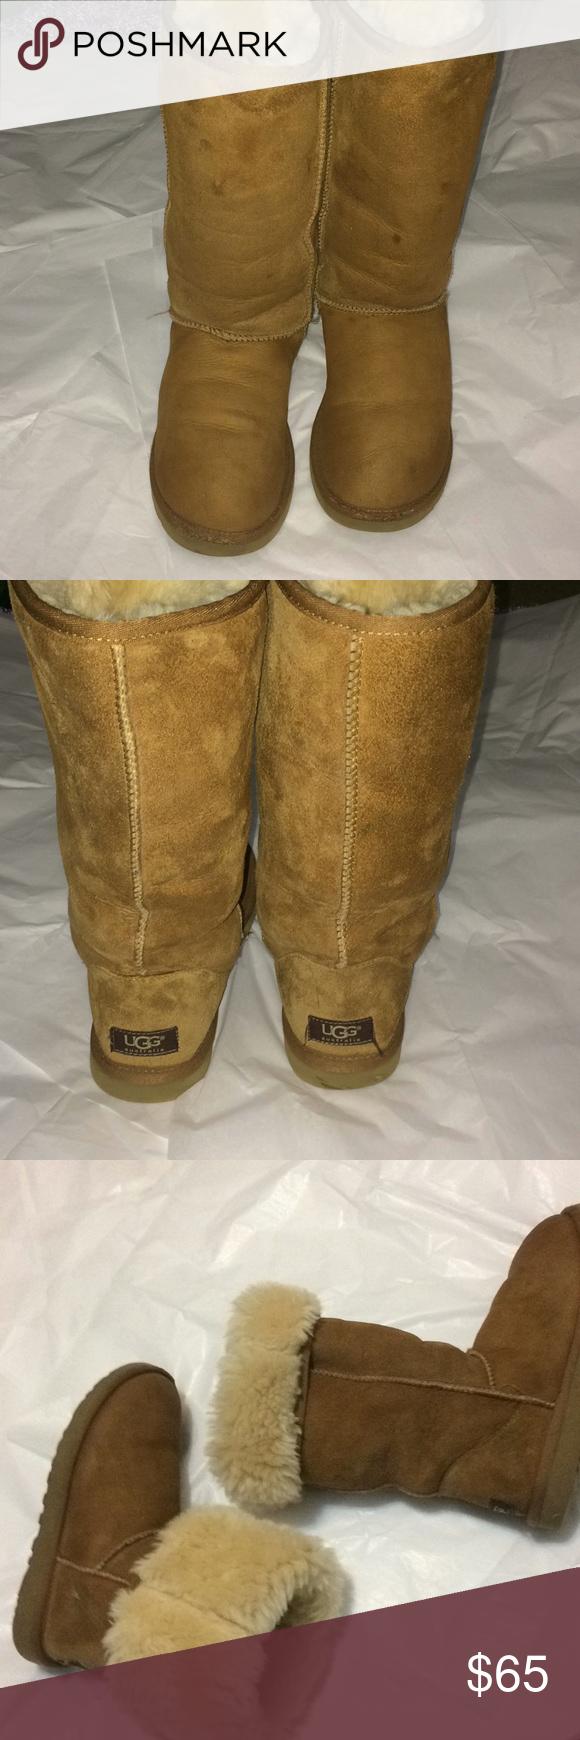 8de5491d4c1 ⚡️Flash sale ⚡️🌹Tall ugg boots | Tall ugg boots, UGG australia ...